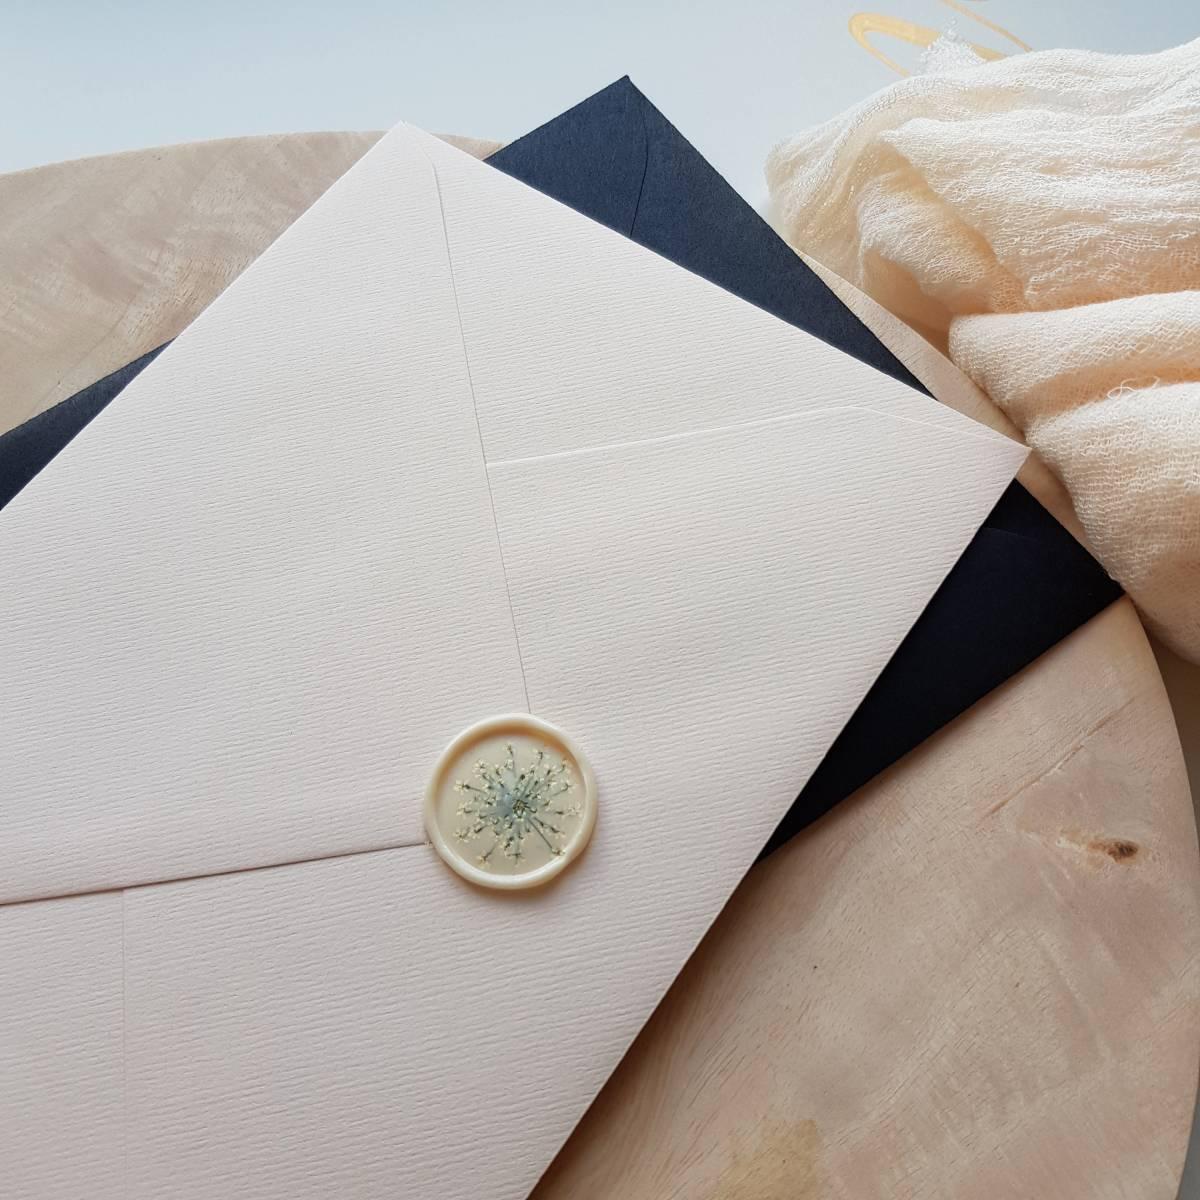 Touch of Gold - Trouwuitnodiging - Huwelijksuitnodiging - Kalligrafie - House of Weddings - 24